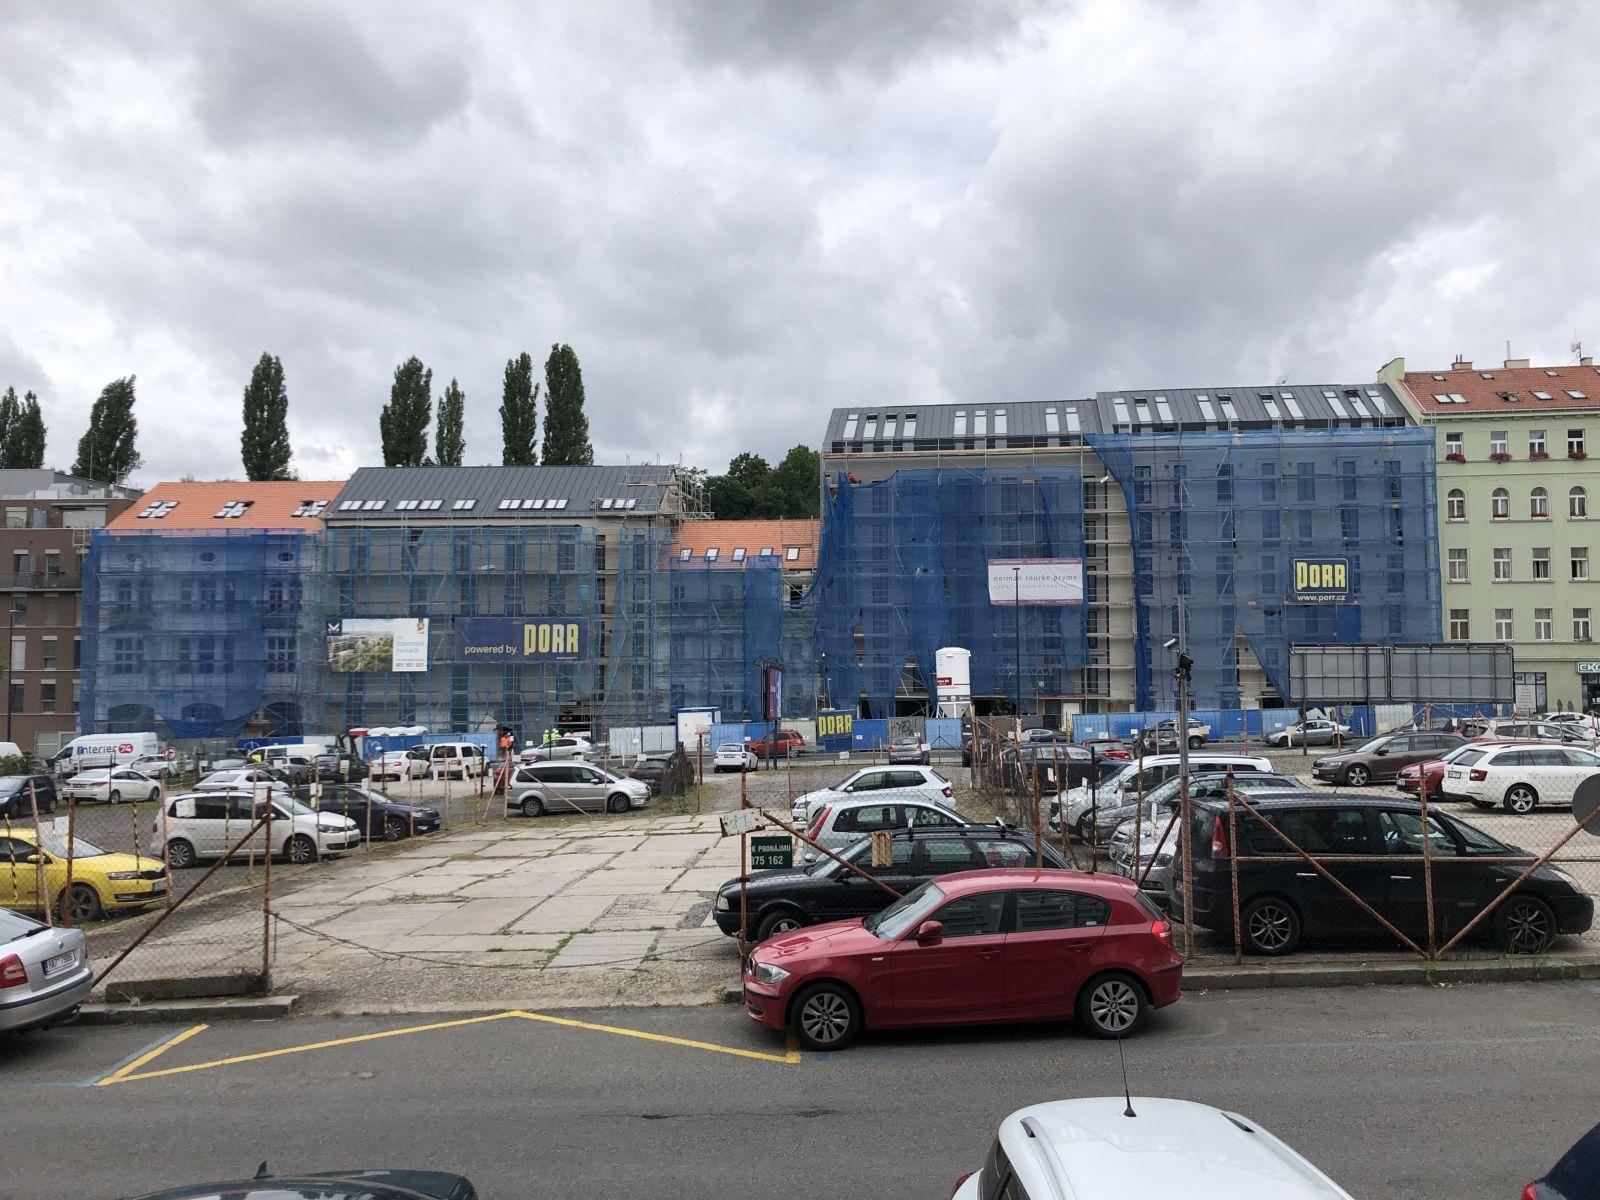 Novostavba mezonetu 2kk/T, 81 + 17 m2, Praha 3 - Žižkov